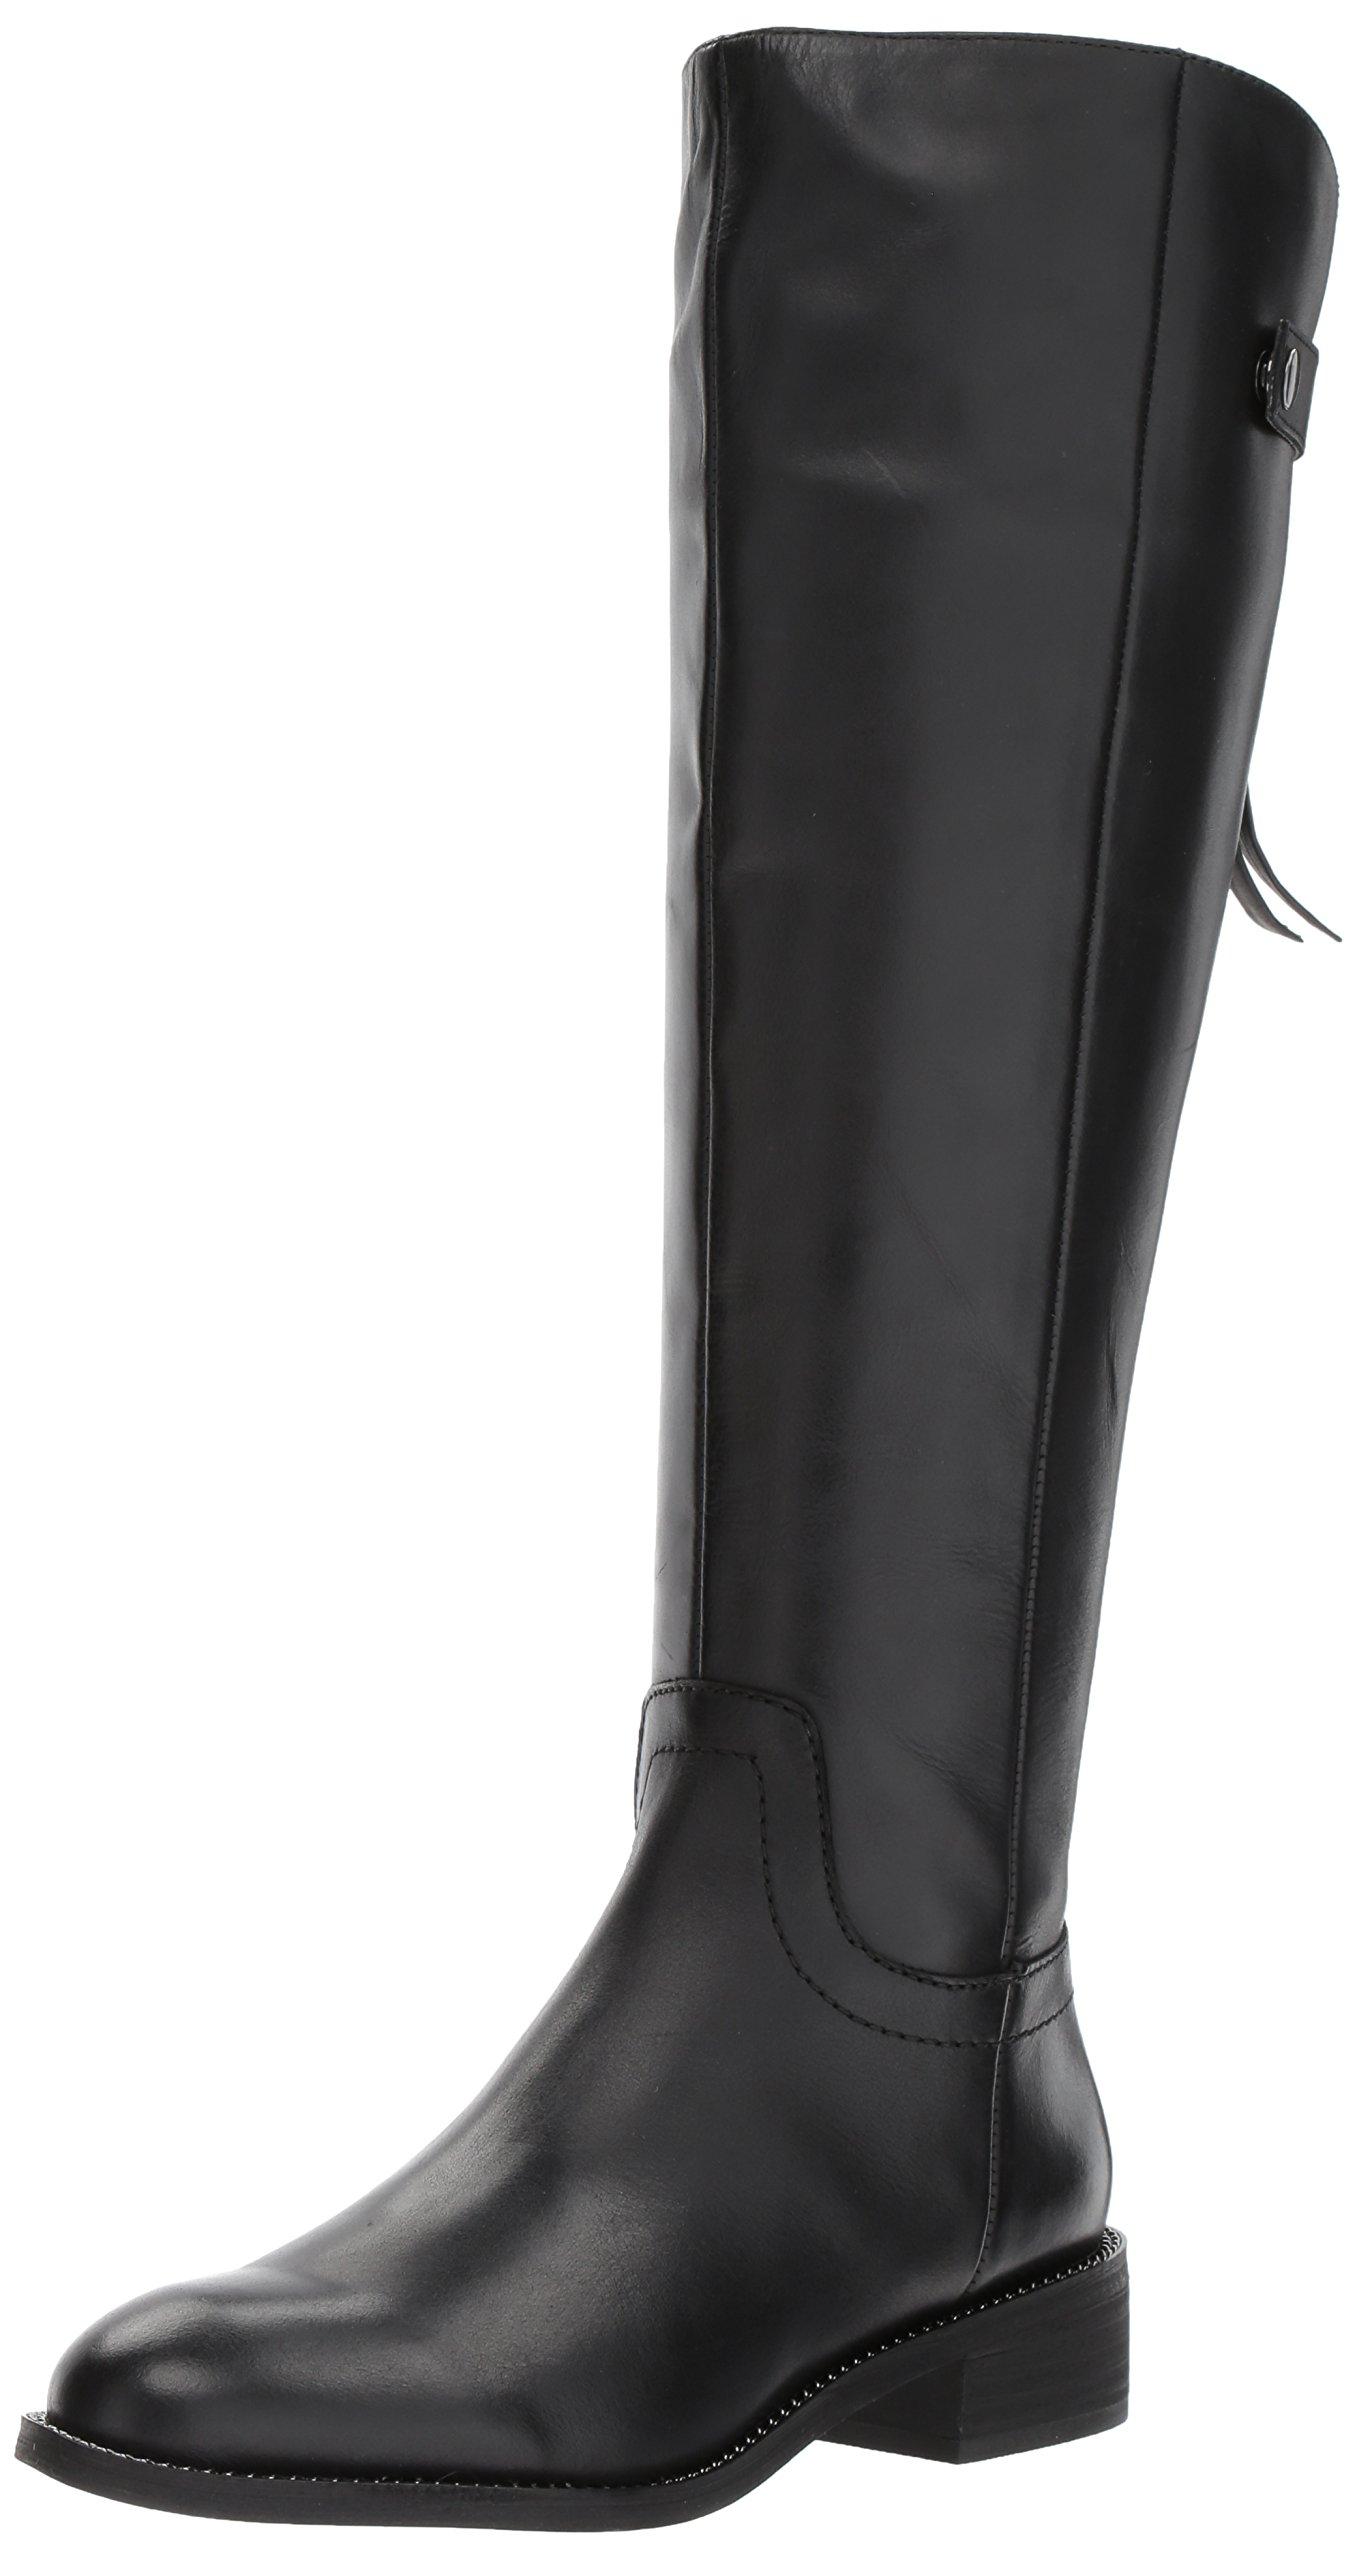 Franco Sarto Women's Brindley Equestrian Boot, Black, 8.5 M US